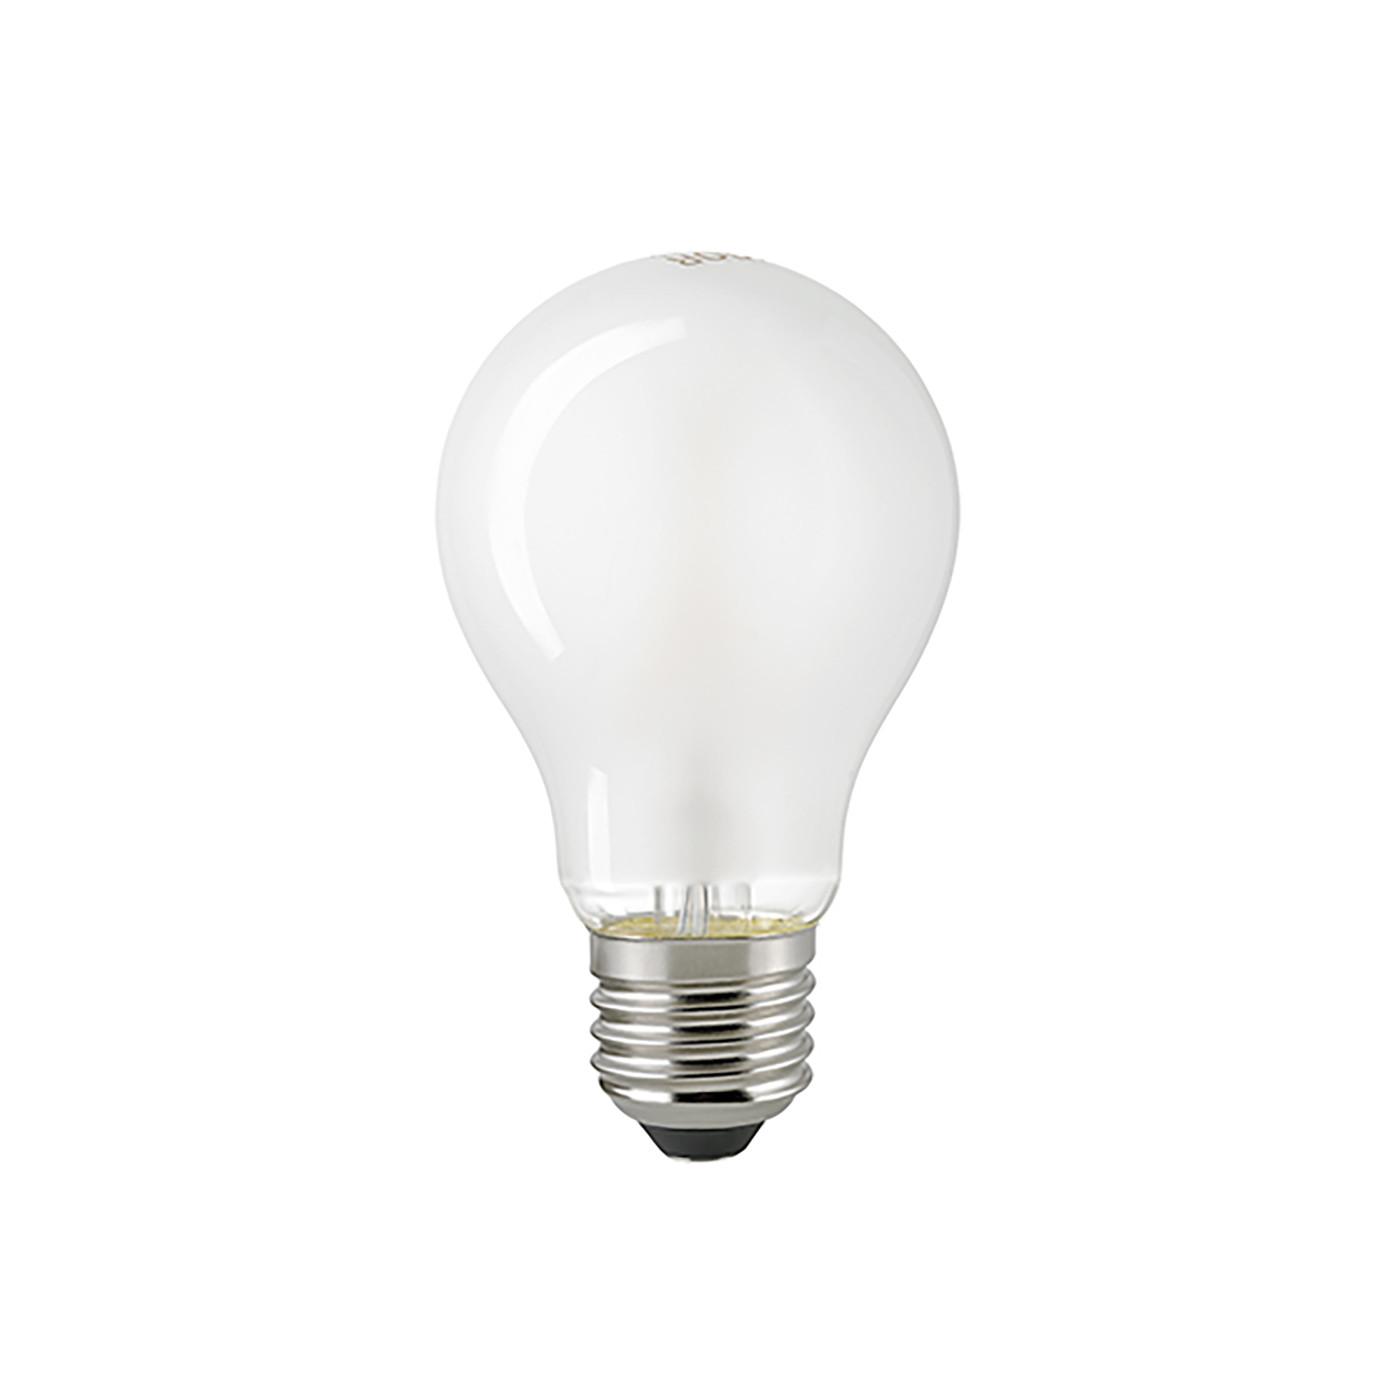 Sigor LED-Filament-Standardlampe A60 11W 2700K 230V E27 matt